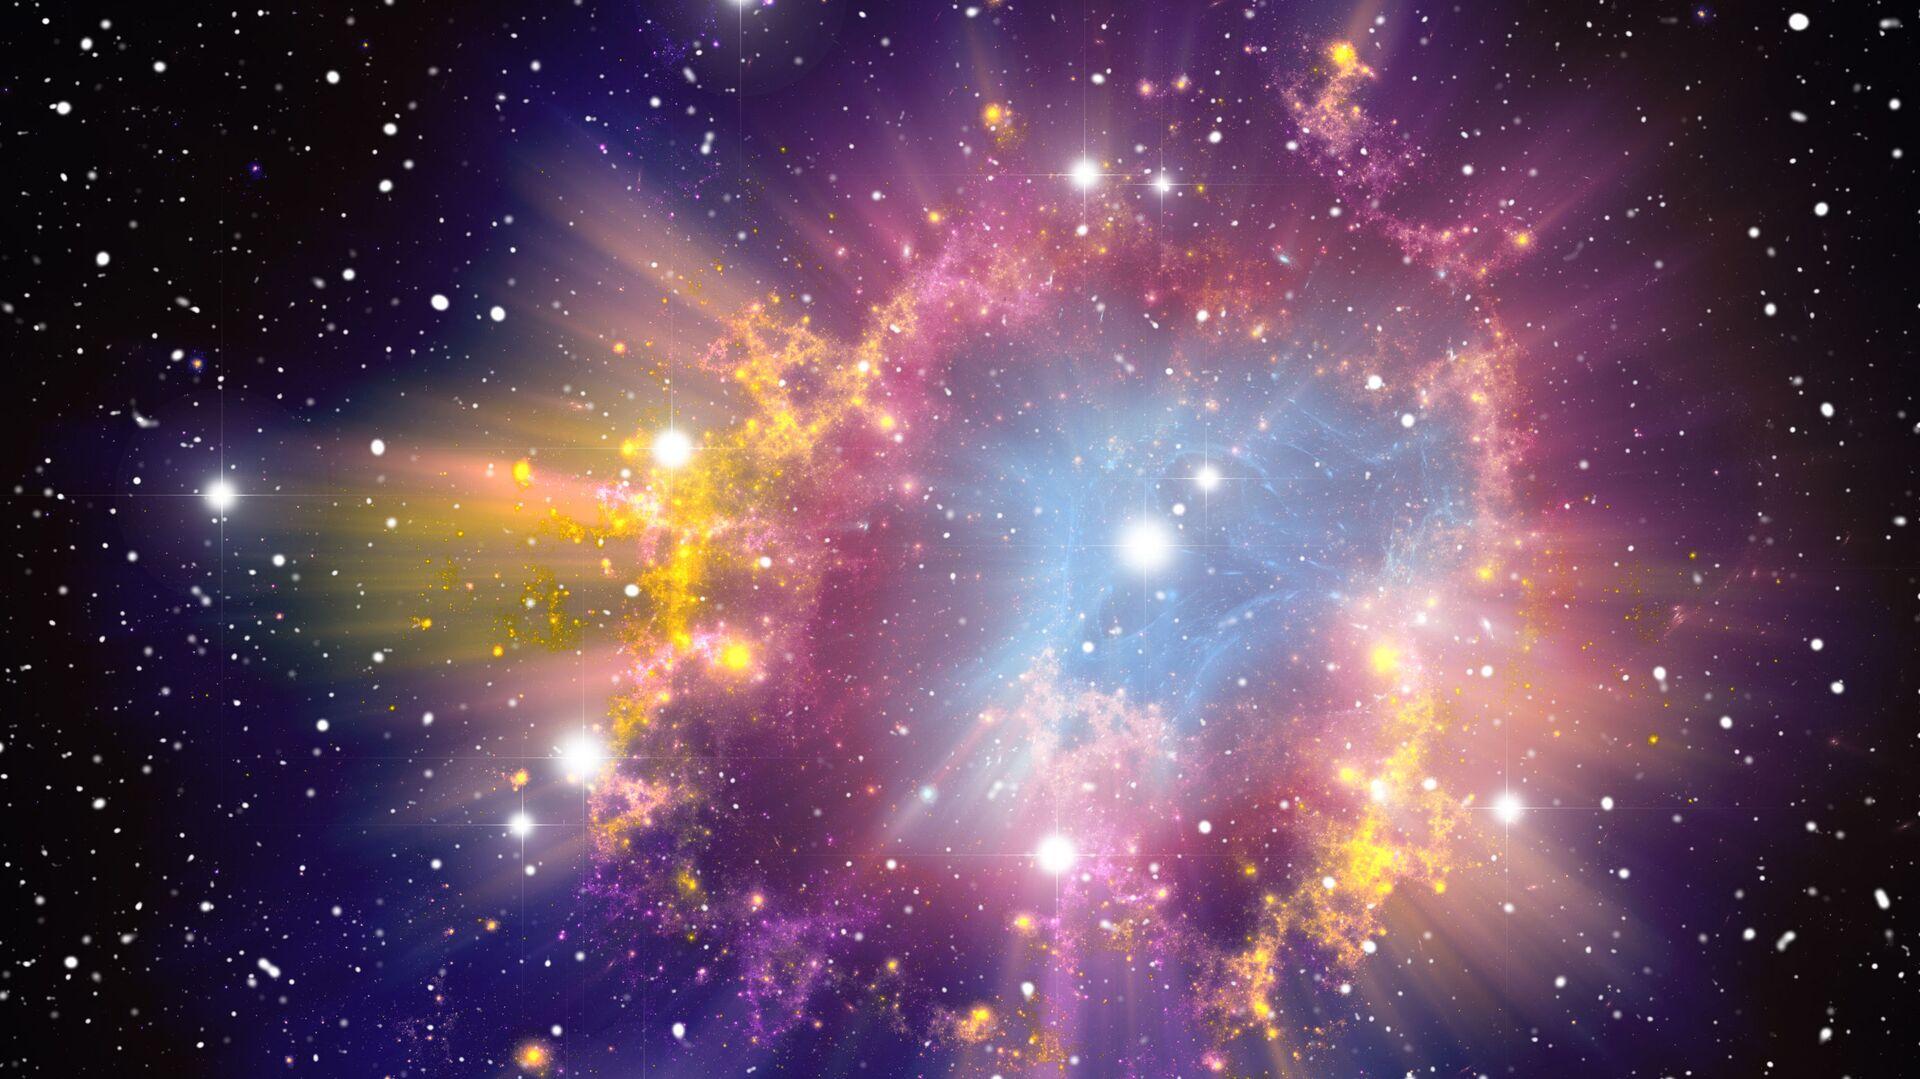 Esplosione di una supernova - Sputnik Italia, 1920, 23.05.2021